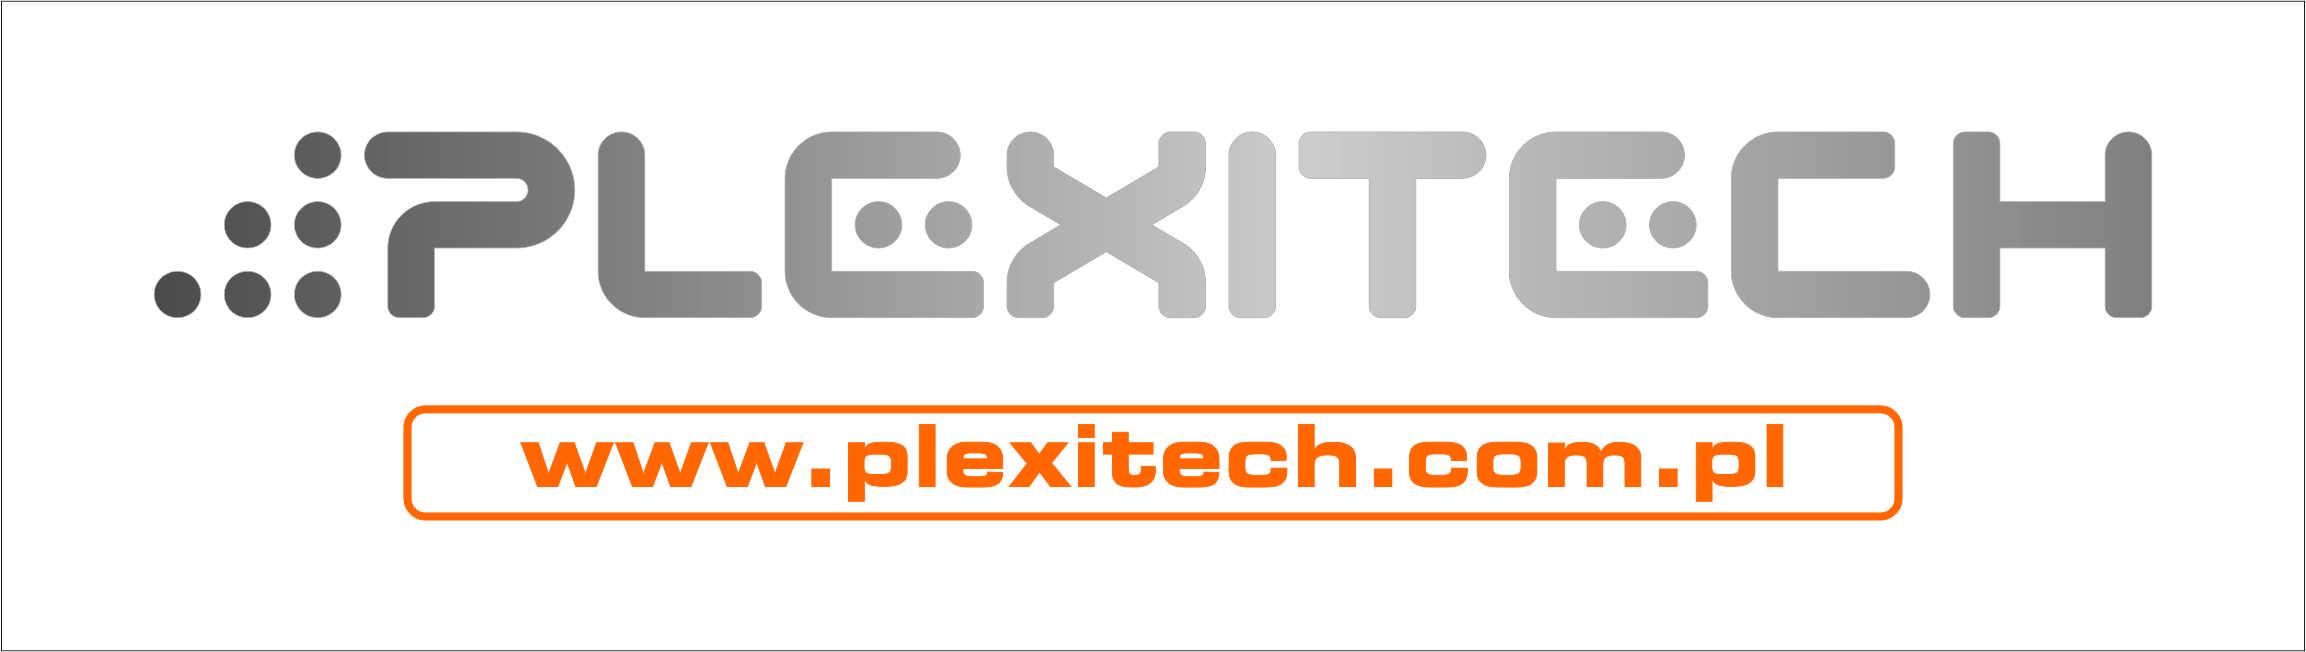 plexitech